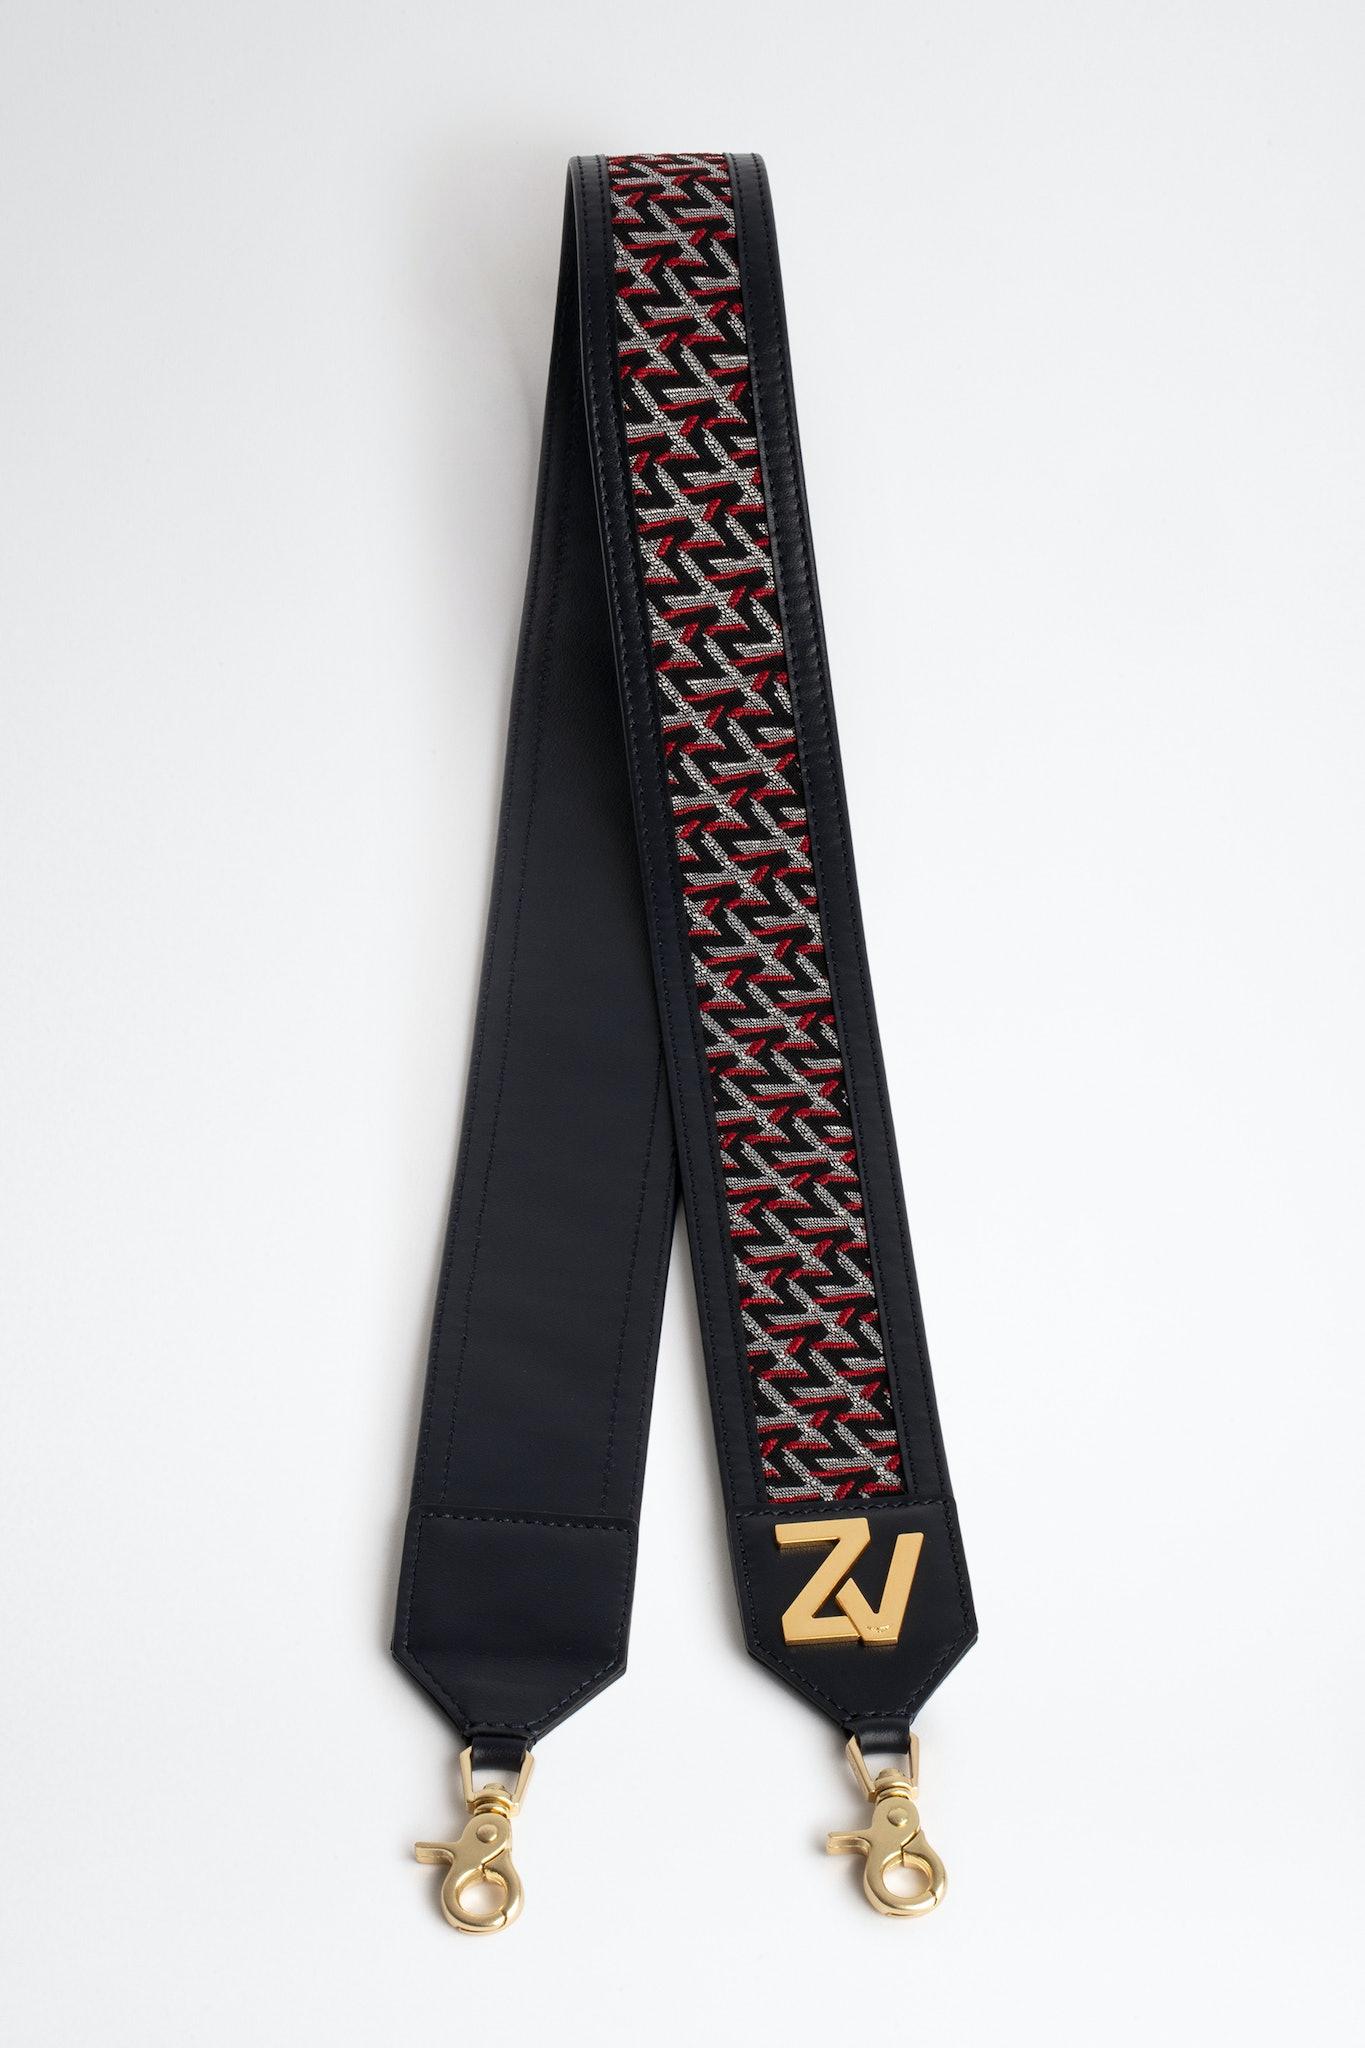 Taschengurt ZV Initiale La Strap Monogram